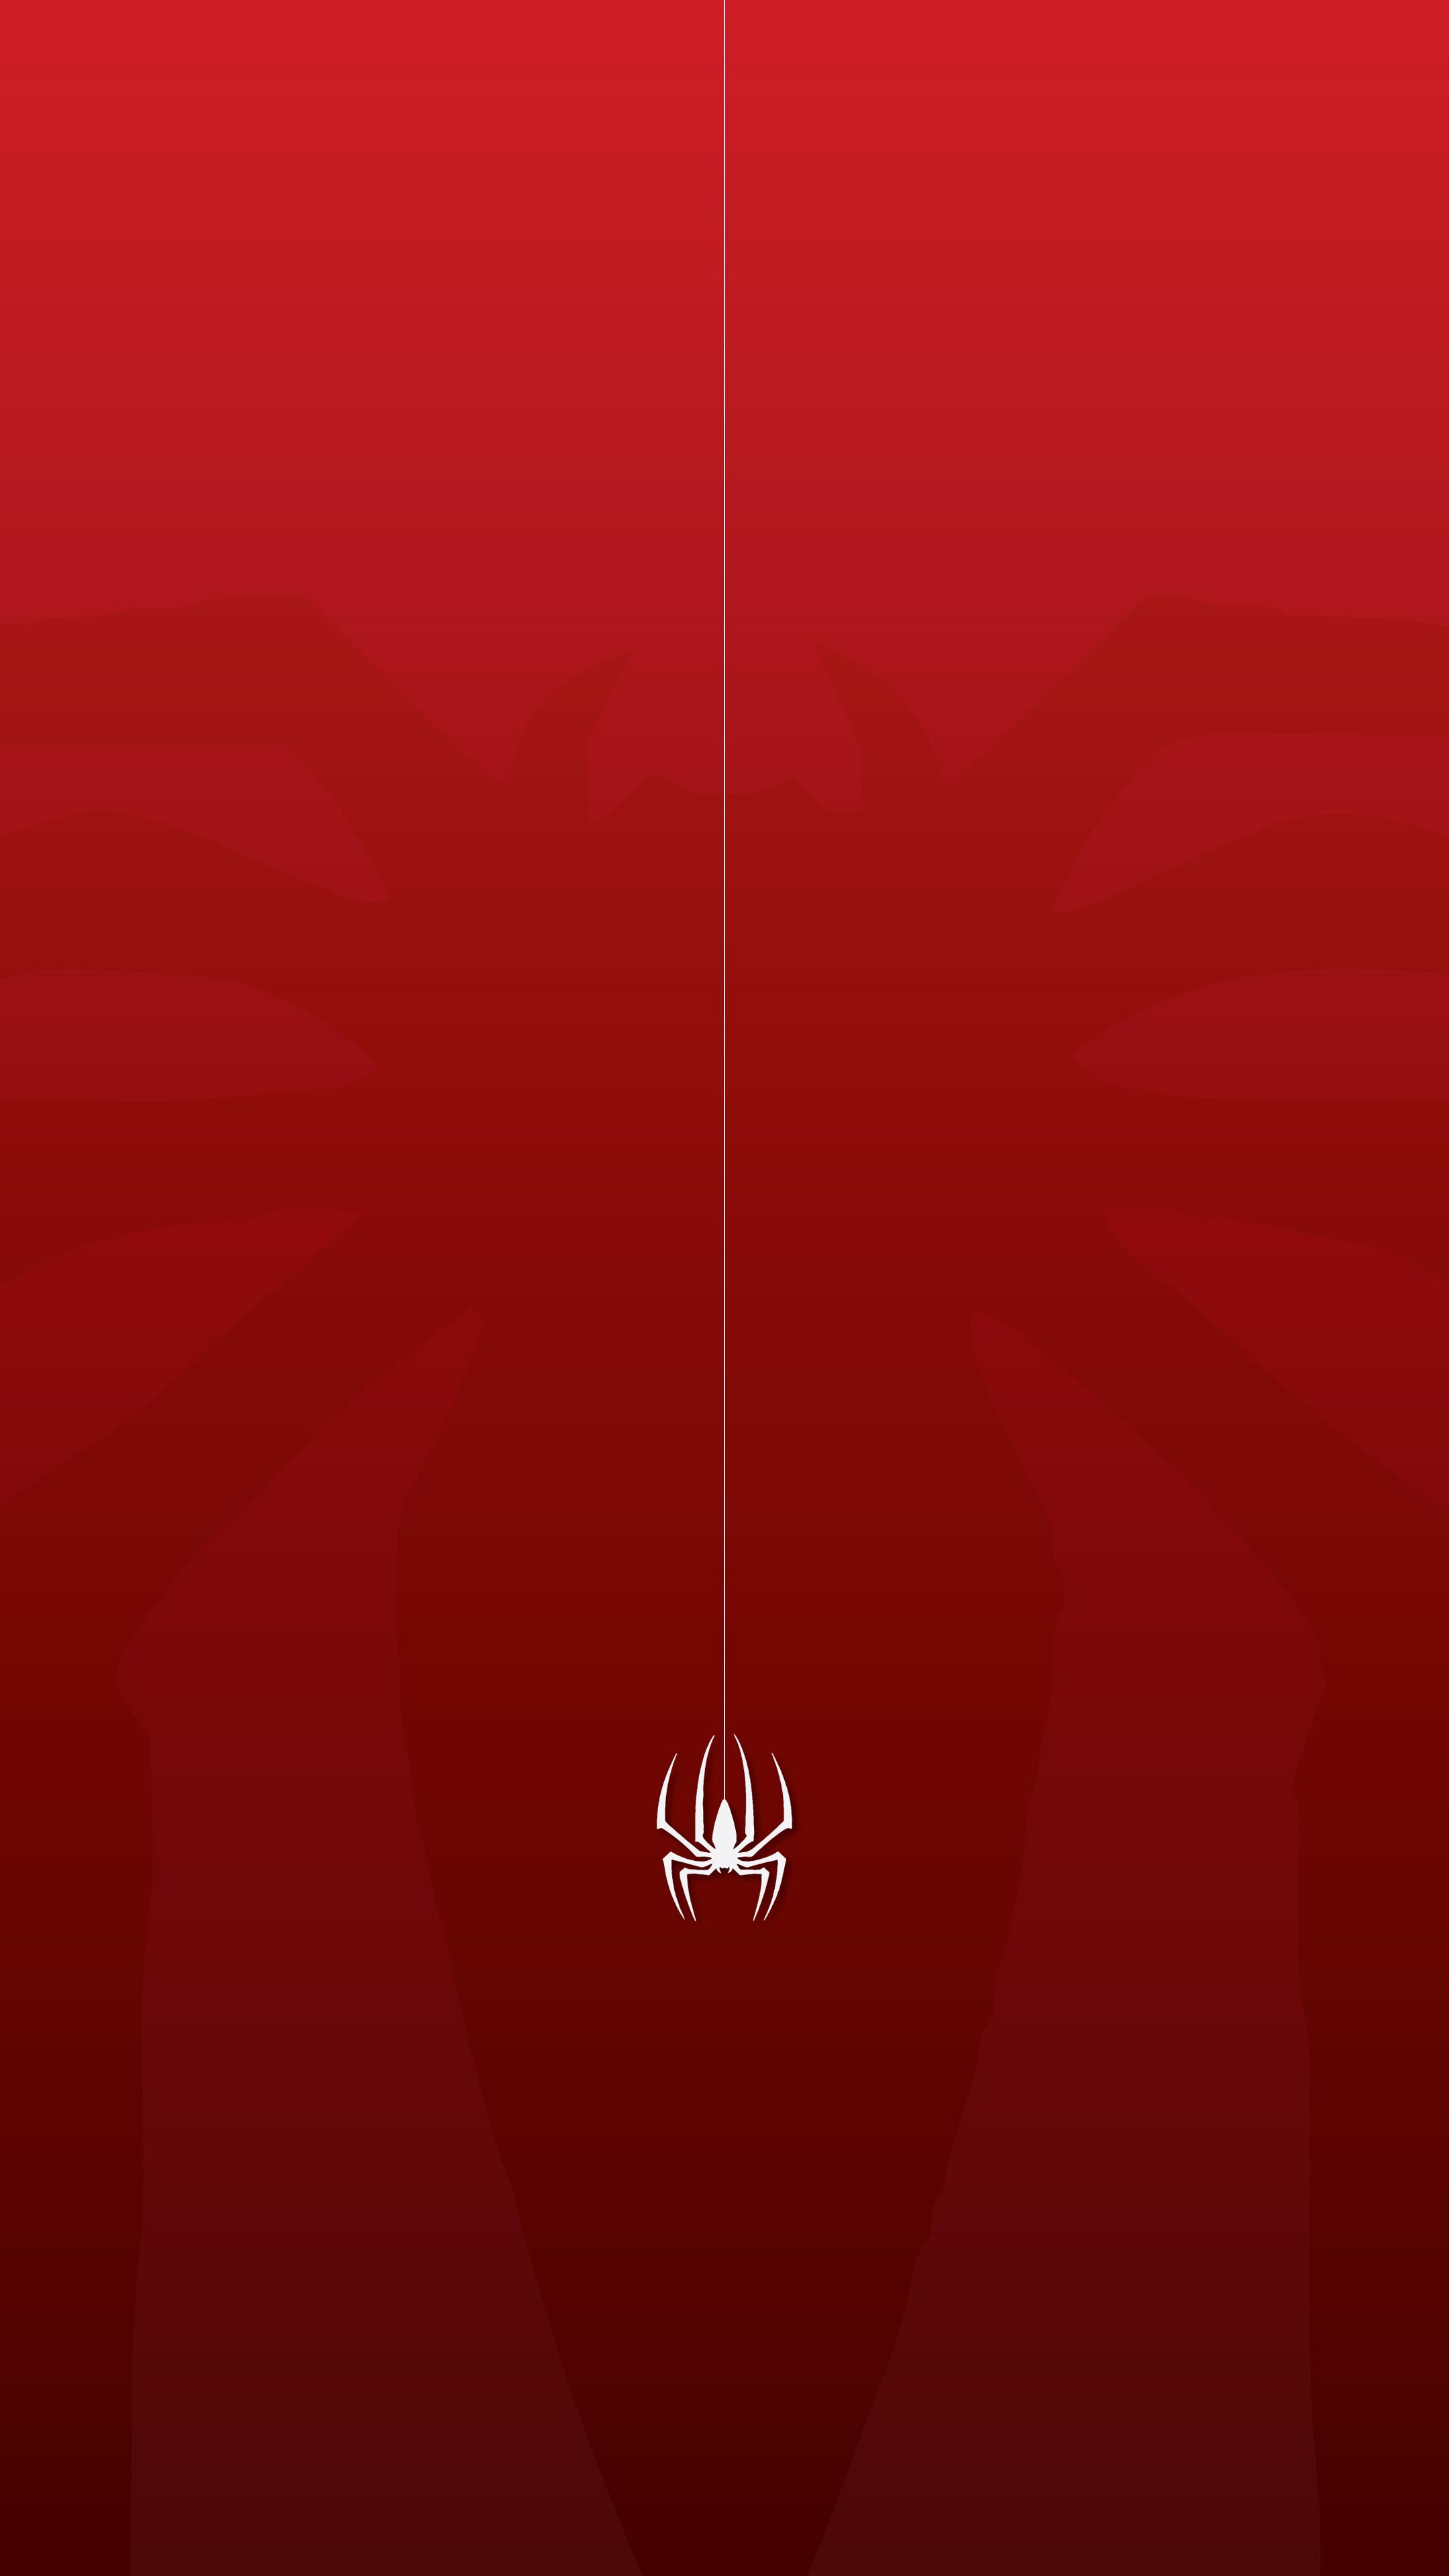 Spiderman Movie Mobile Wallpaper  Miniwallist